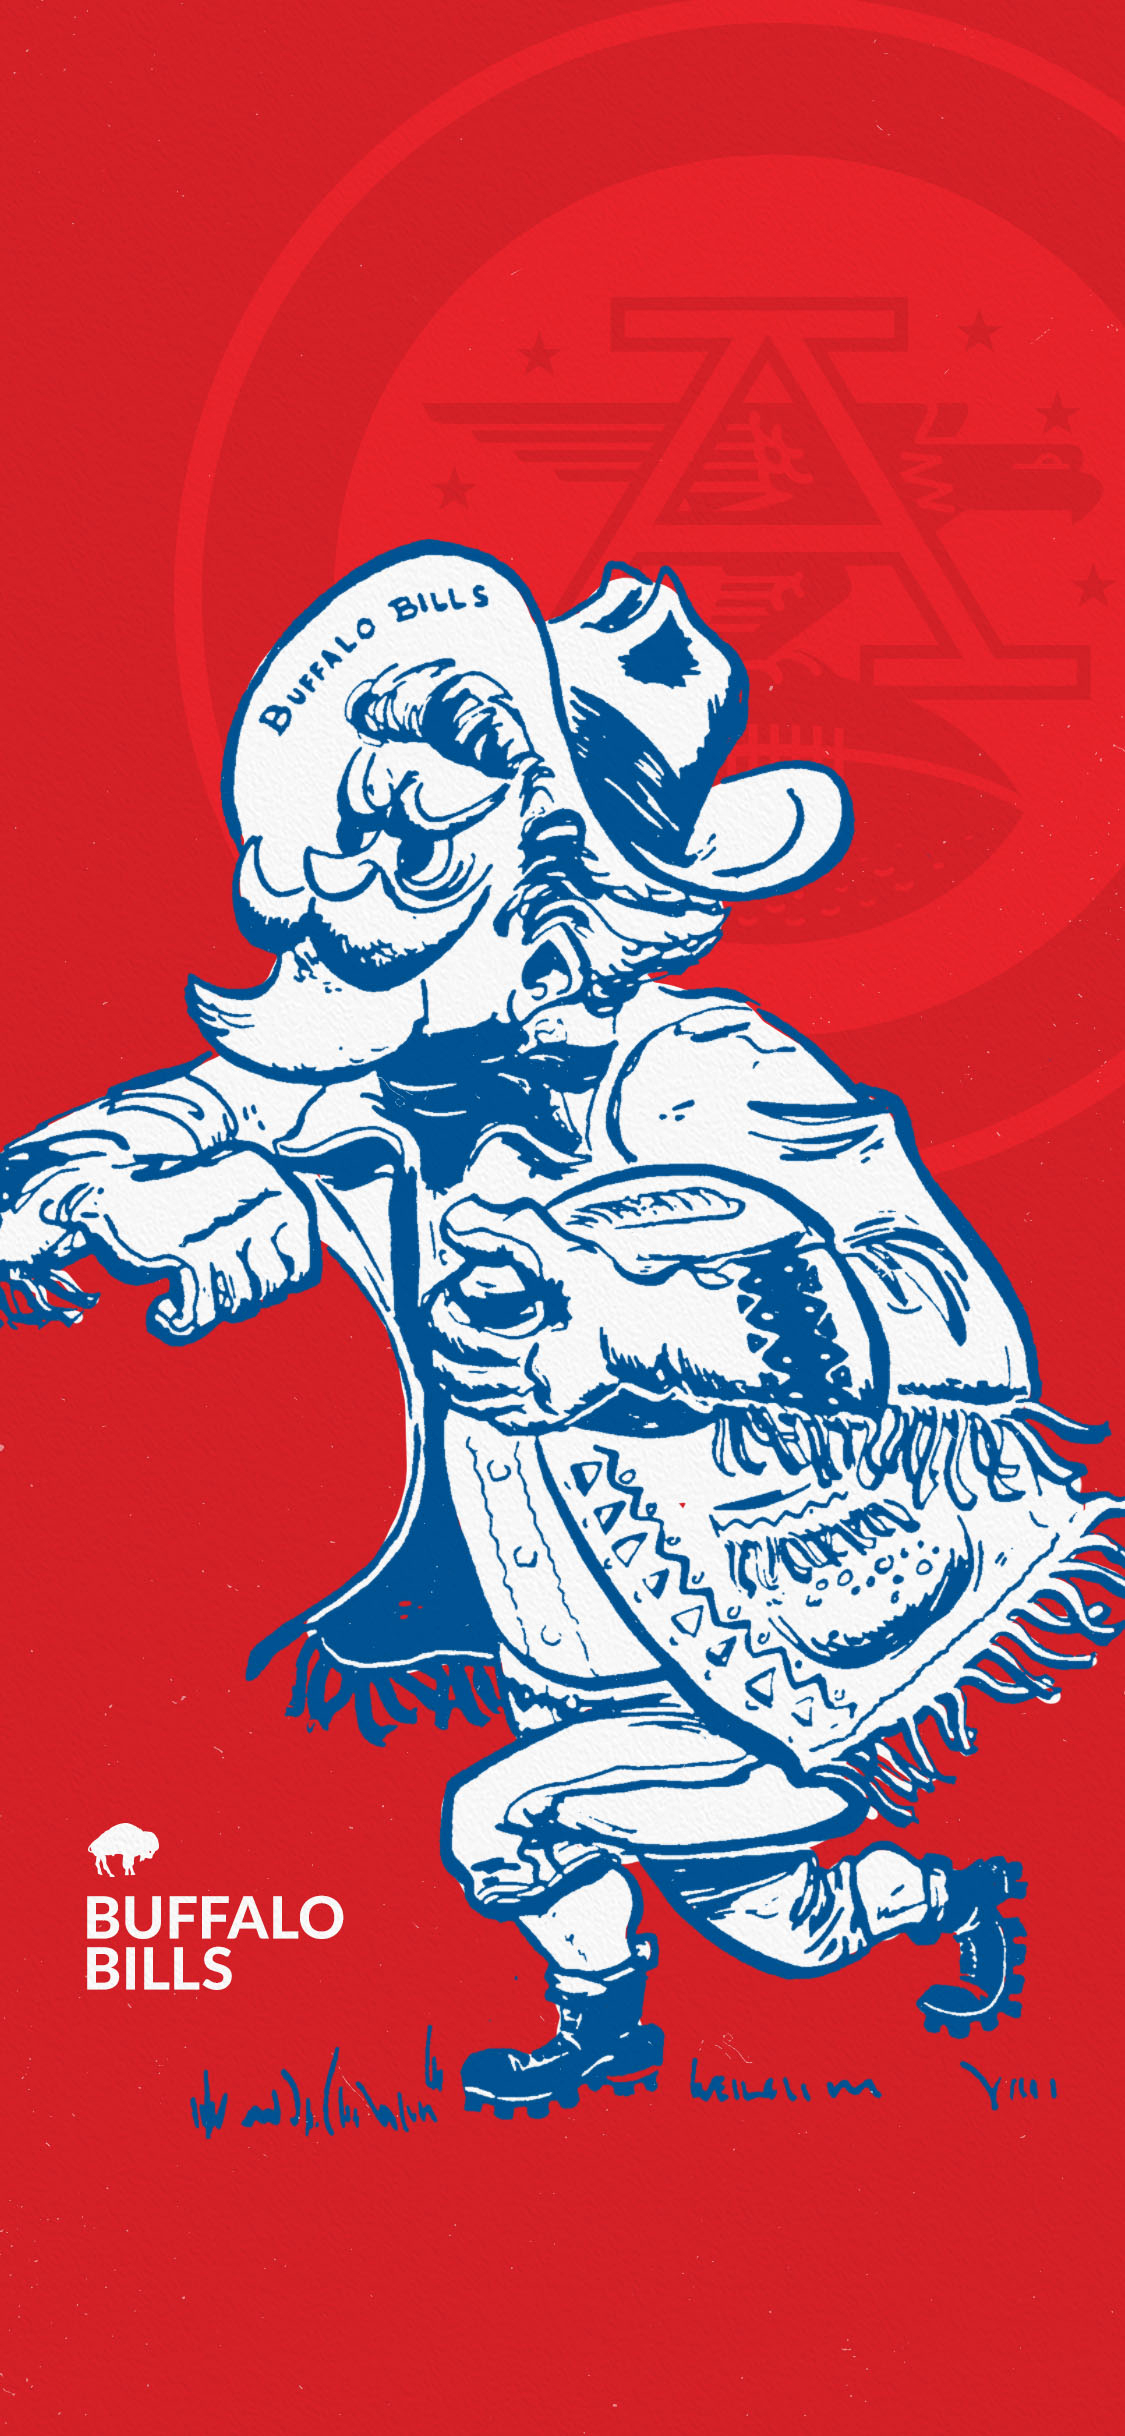 Buffalo Bills Wallpapers   Buffalo Bills - Buffalobills